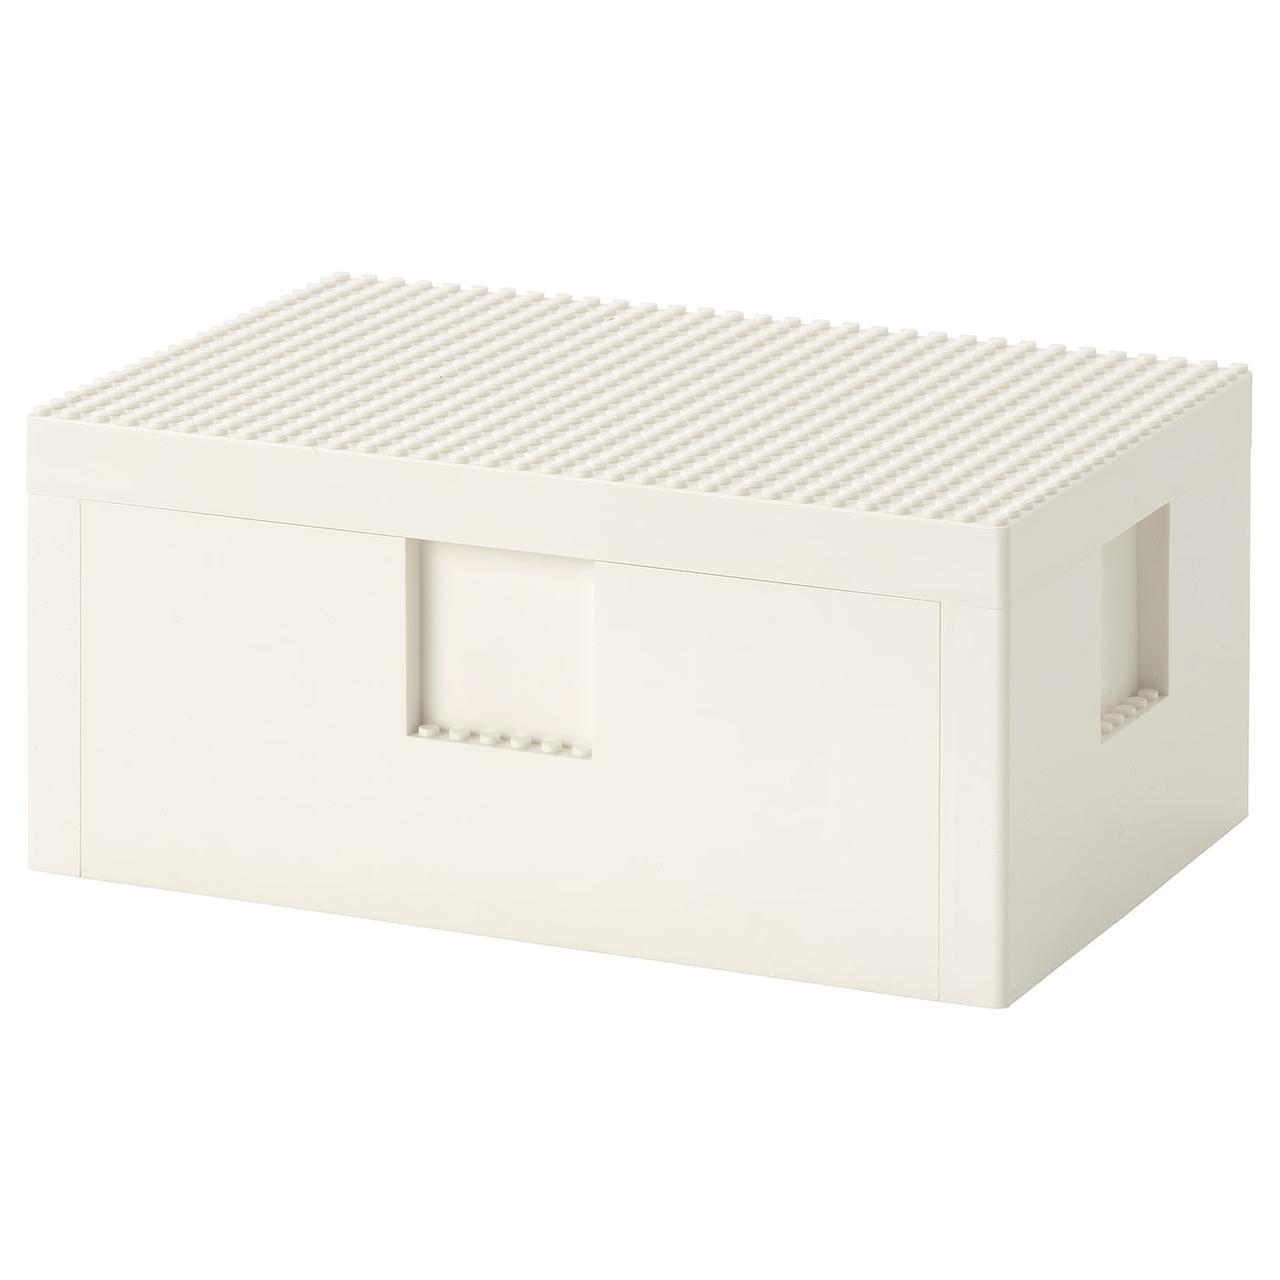 IKEA BYGGLEK Коробка LEGO® с крышкой 26x18x12 см